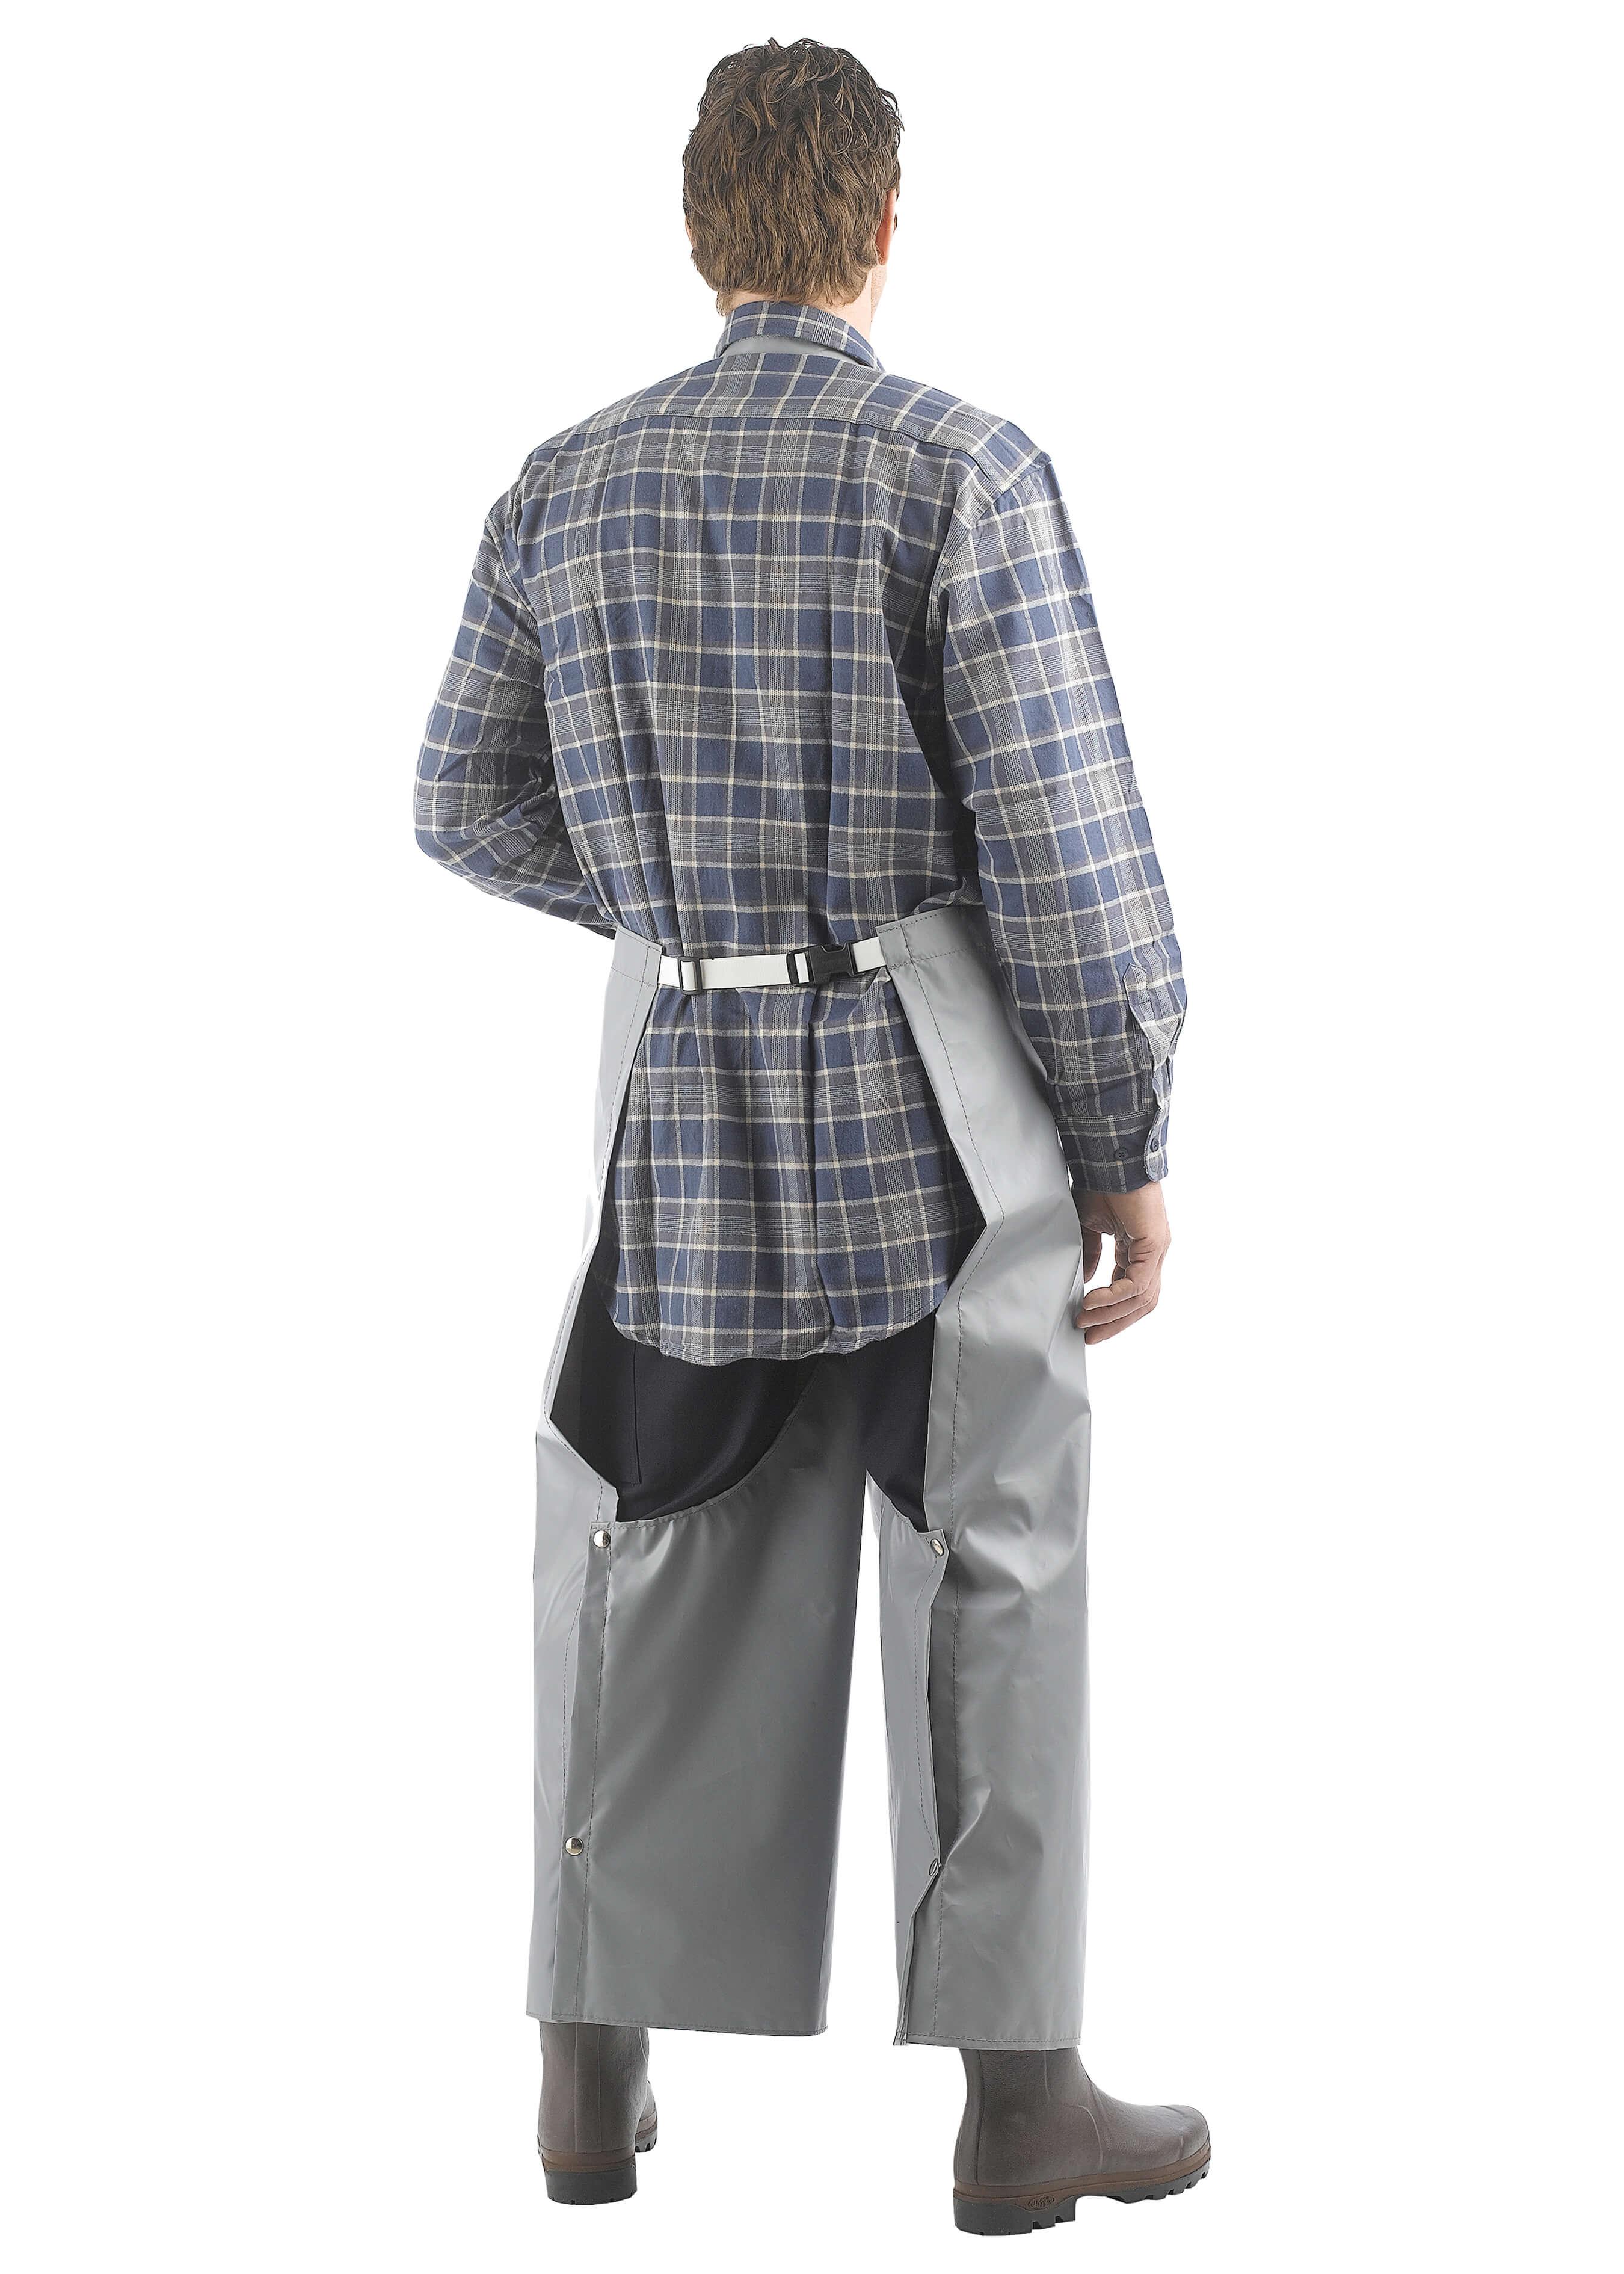 Tablier-pantalon en Trevira L11501110 2